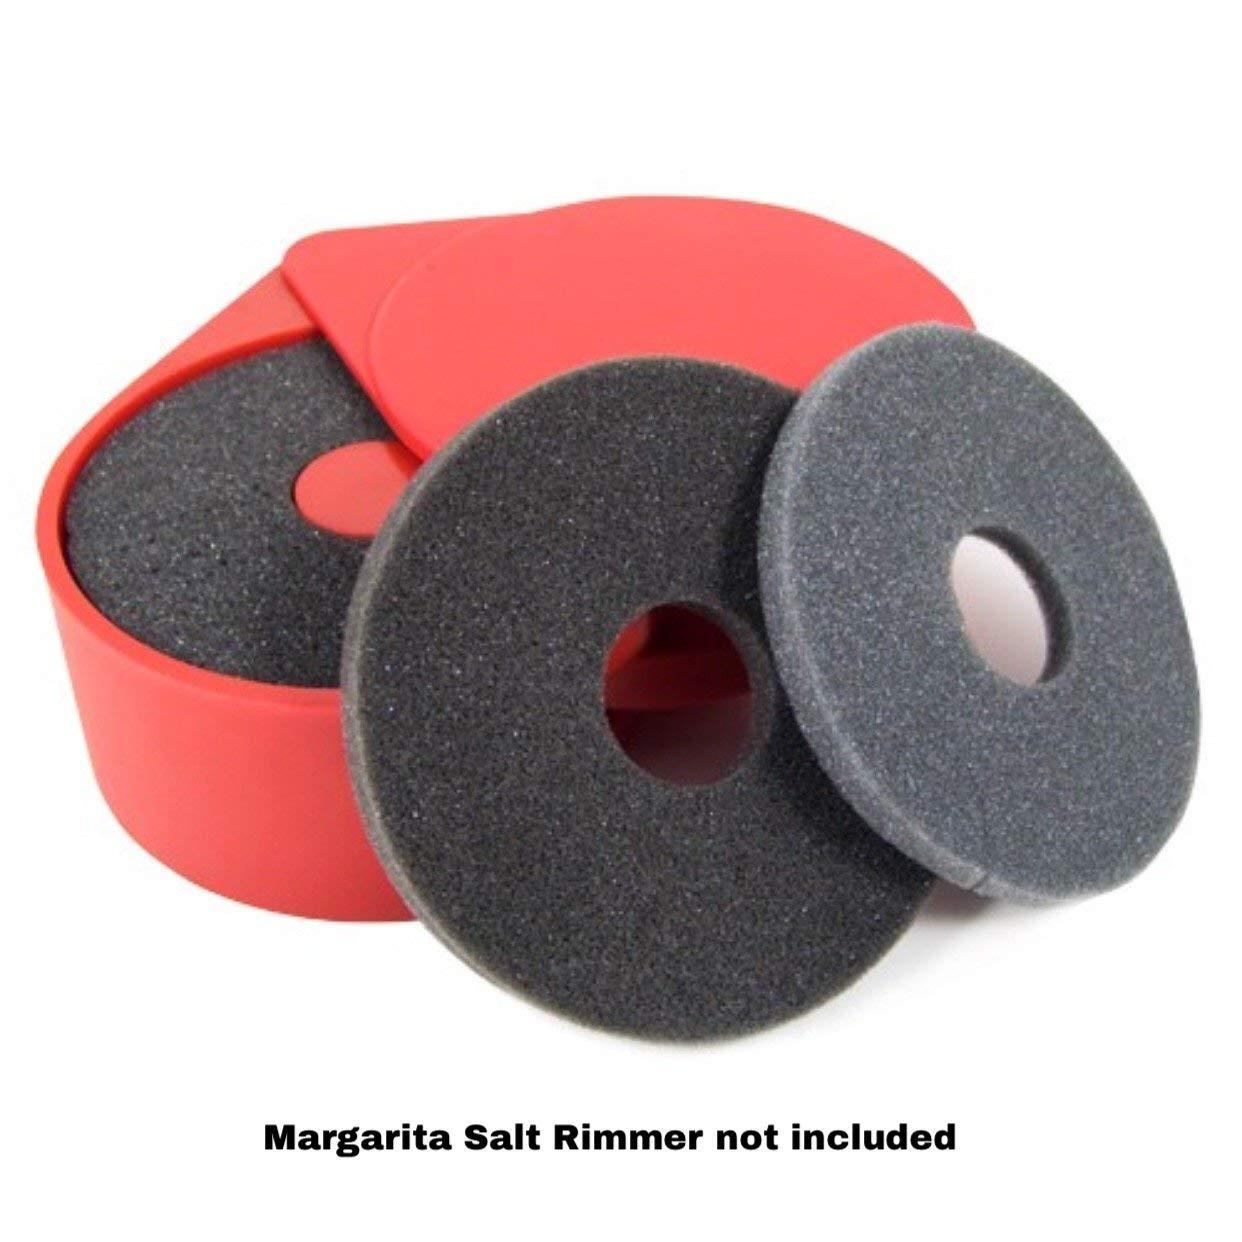 Margarita Salt Glass Bar Rimmer Replacement Sponges Set of 6, Black by SUMMIT Salt Rimmer Replacement Sponges (Image #7)